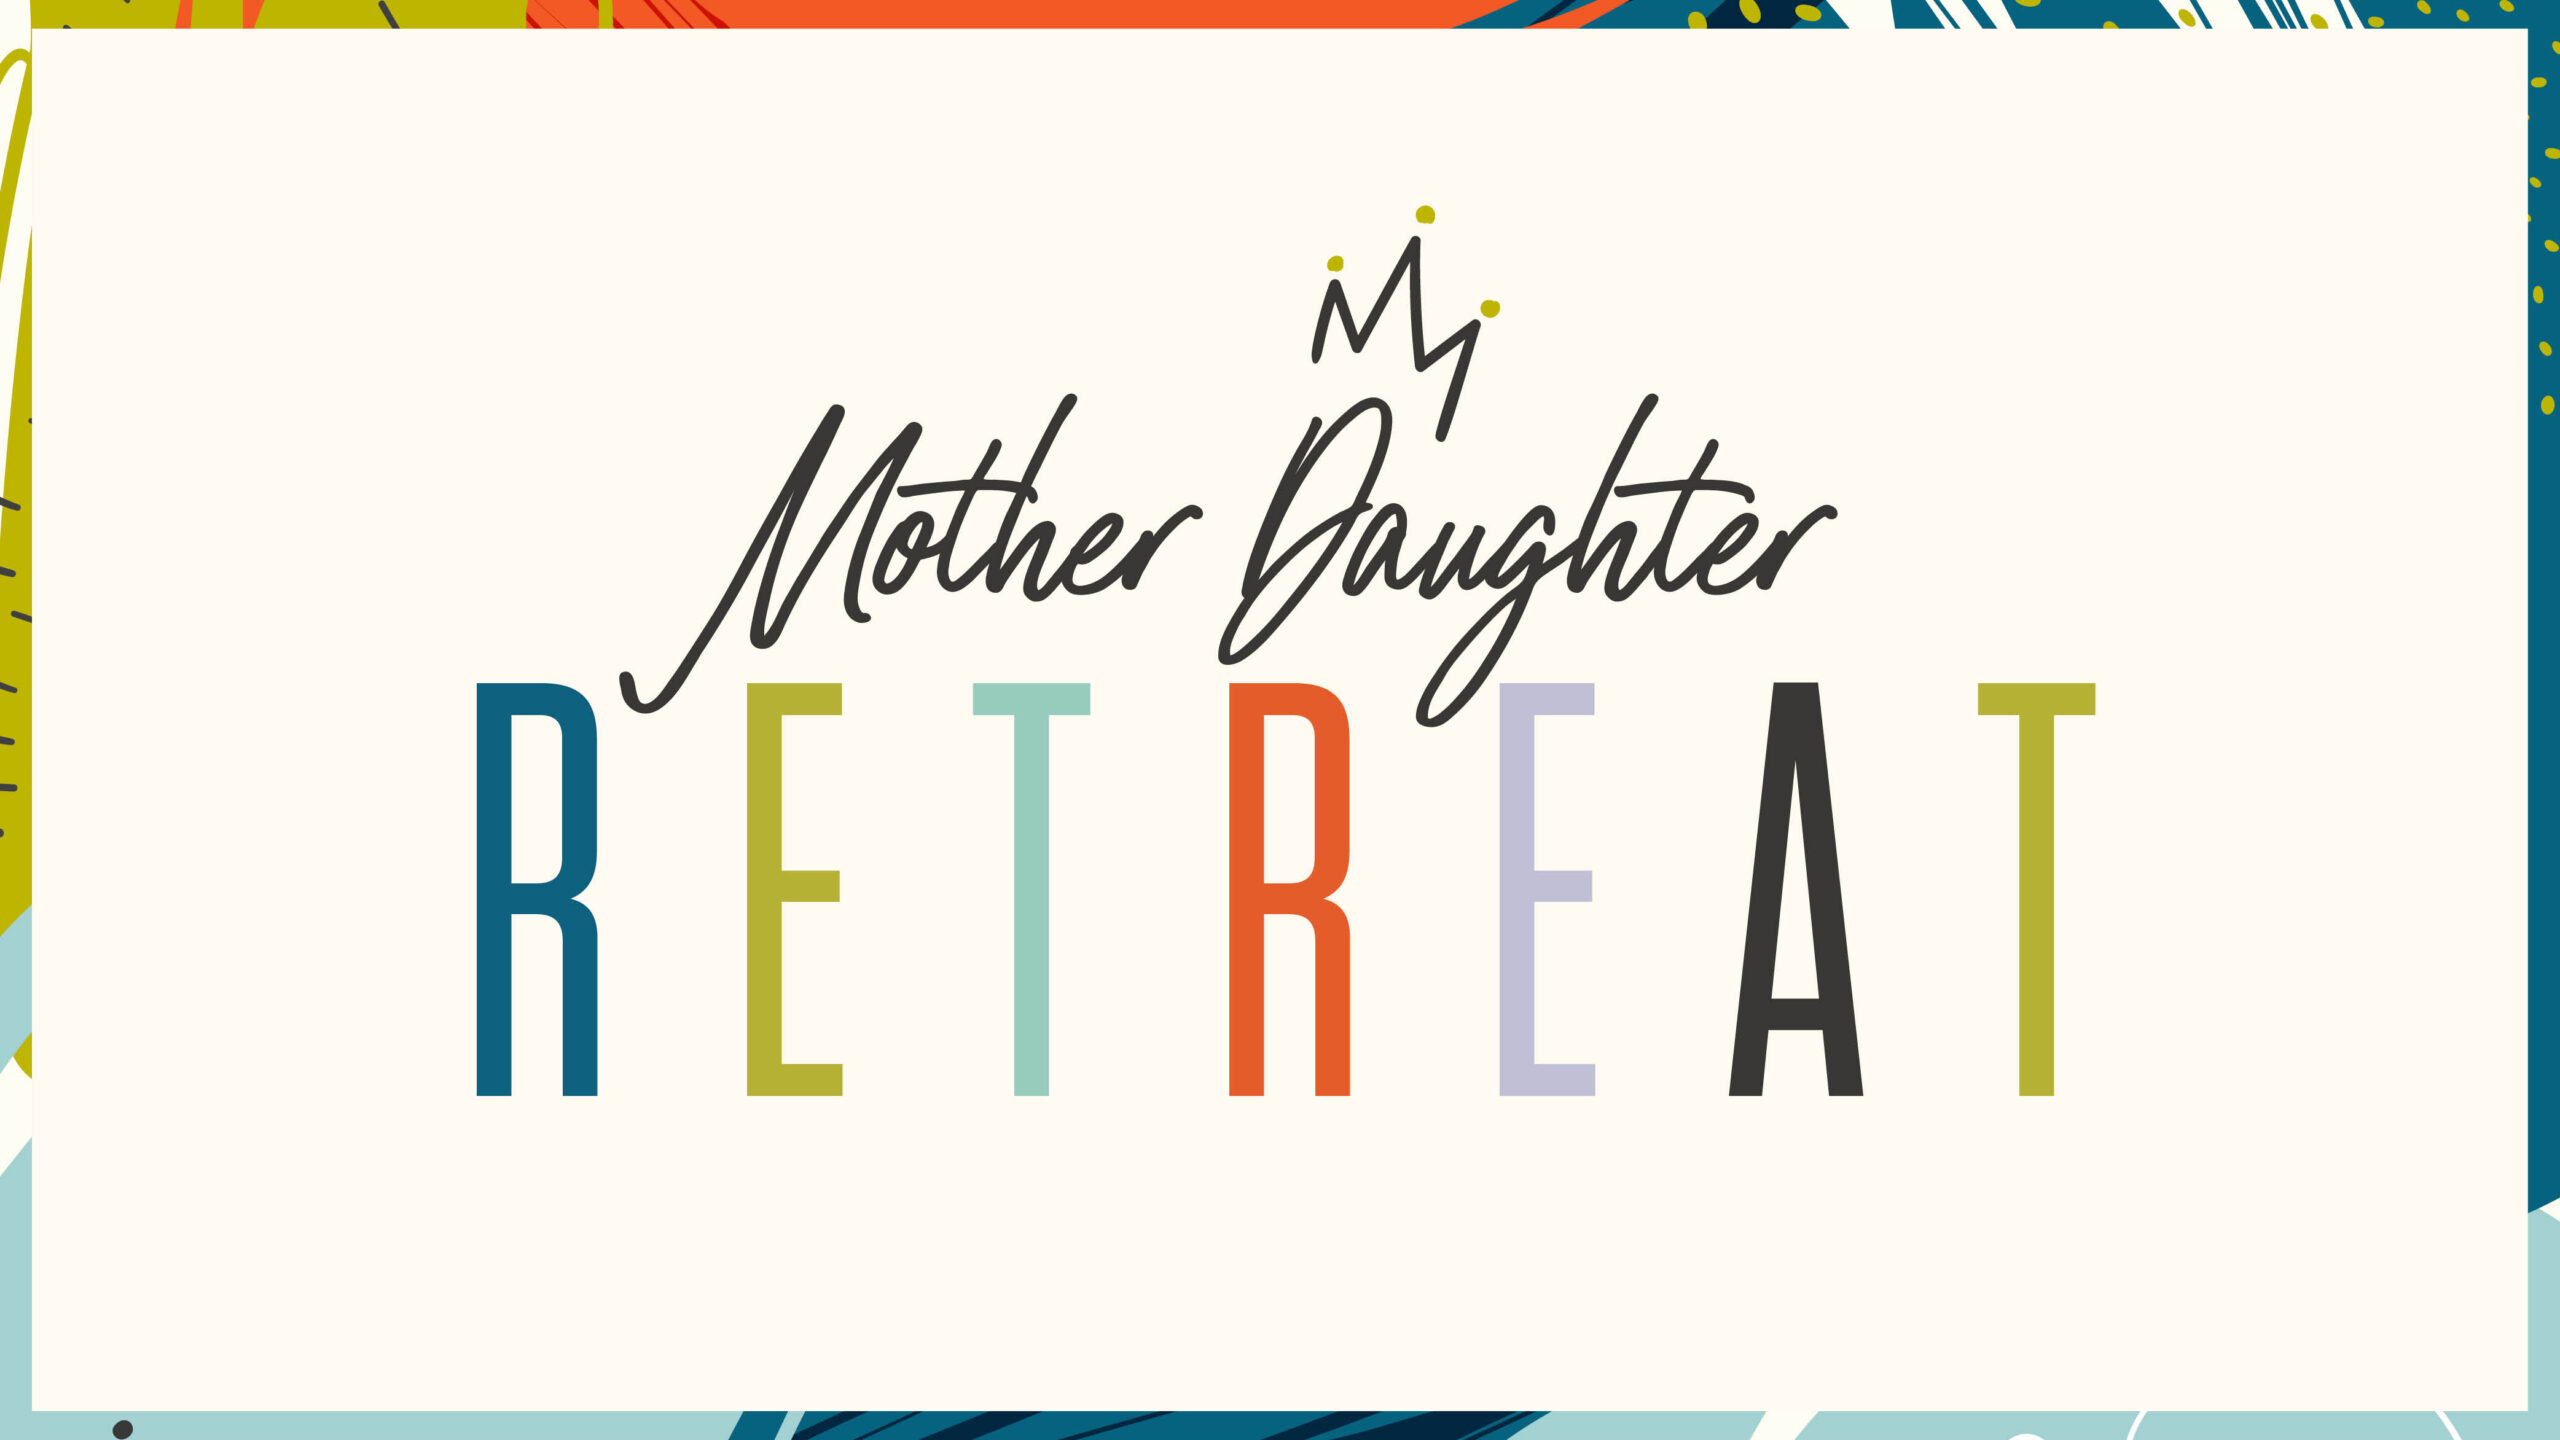 mother daughter retreat